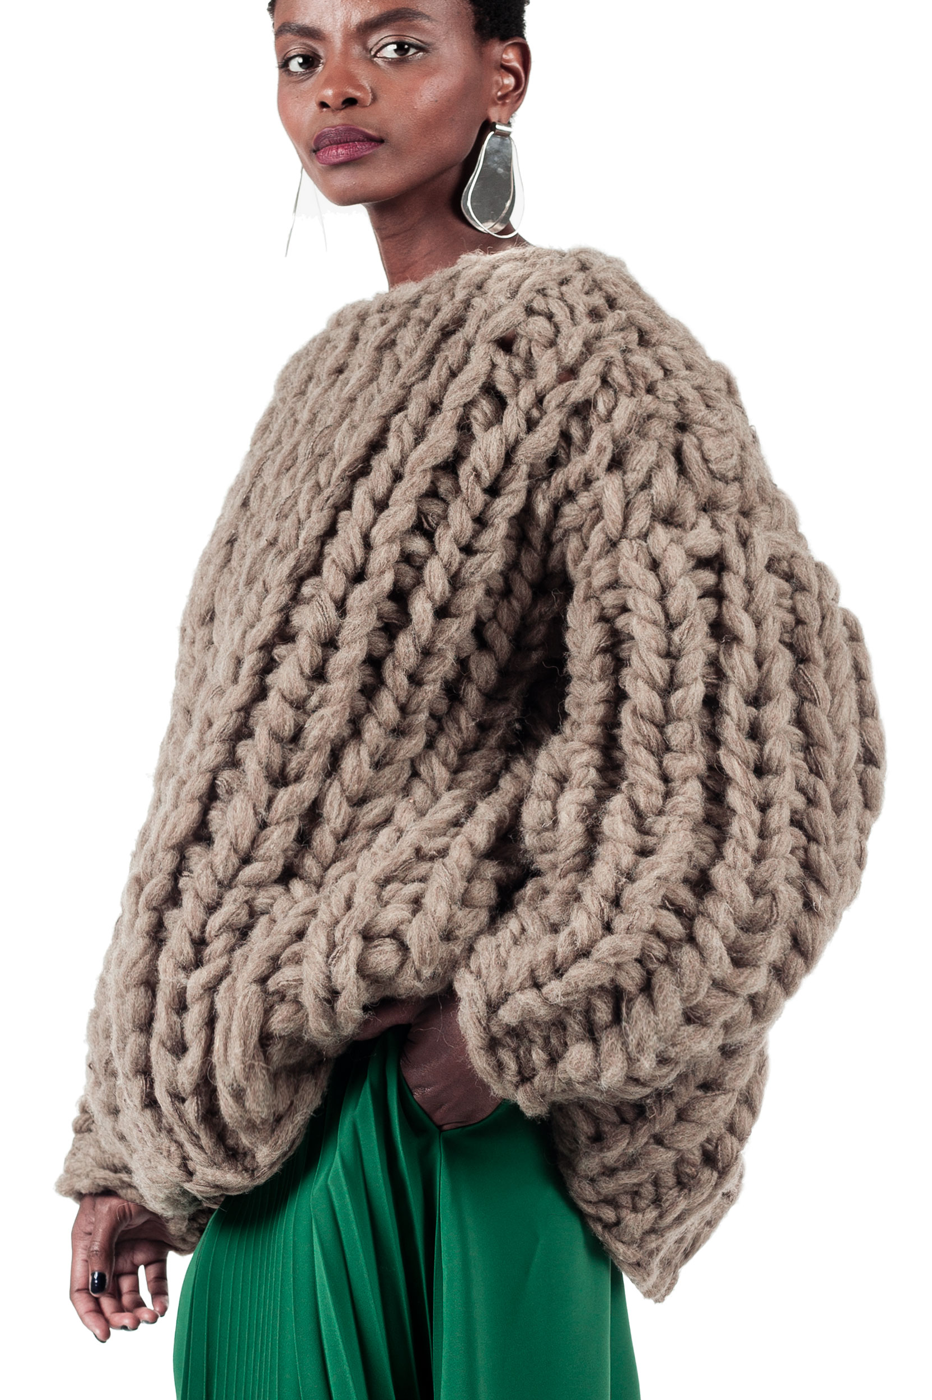 pulover-ioana-ciolacu